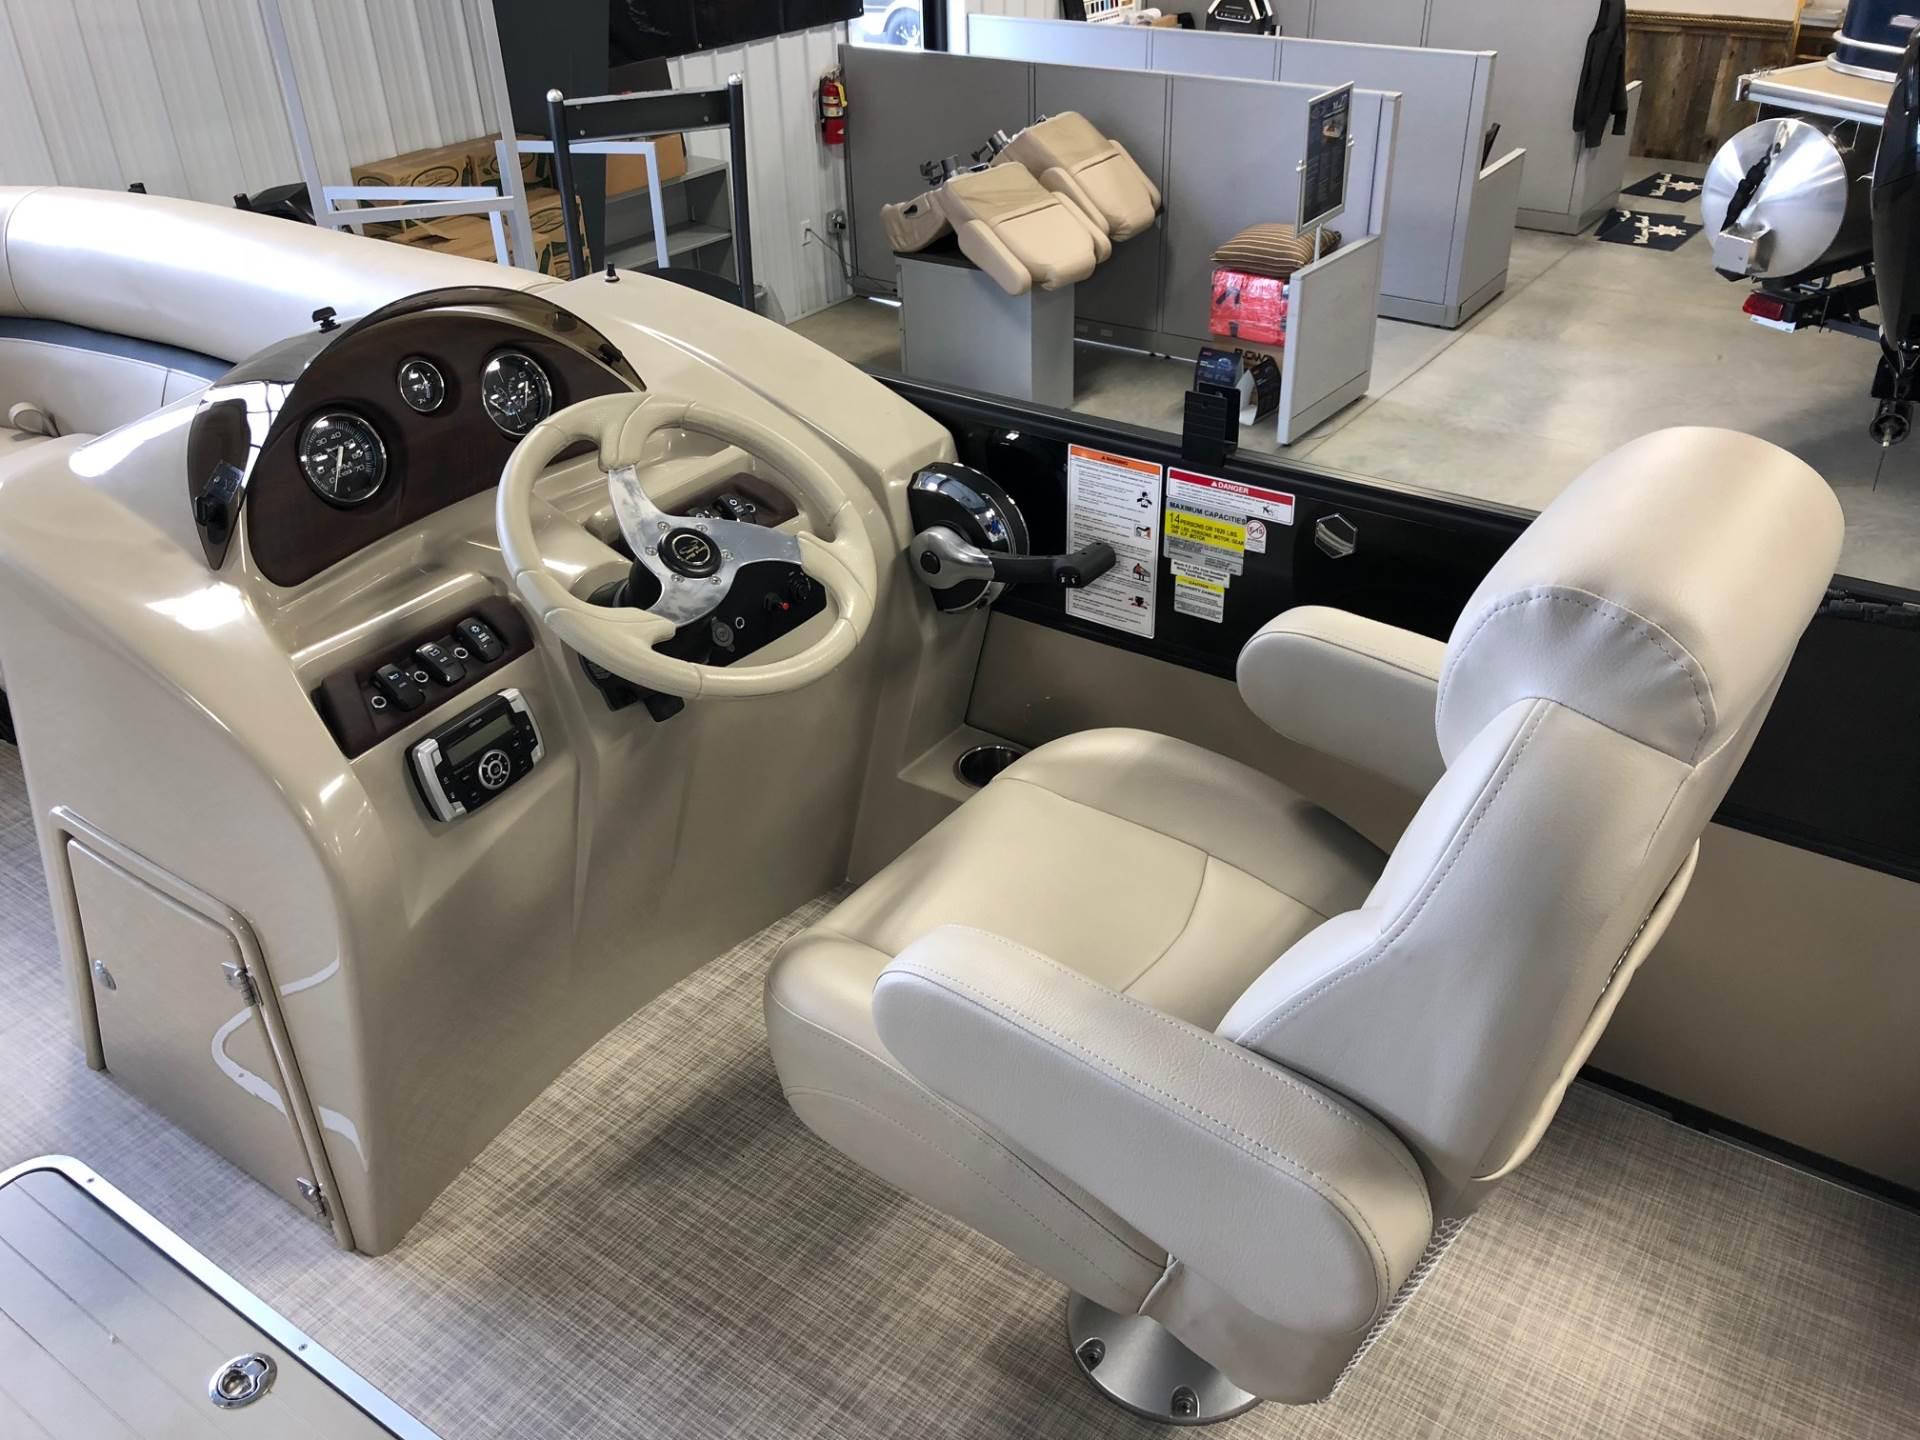 2018 24 Foot South Bay Pontoon Boat For Sale at Captain's Marine in Kalispell Montana 150 HP Mercury Motor